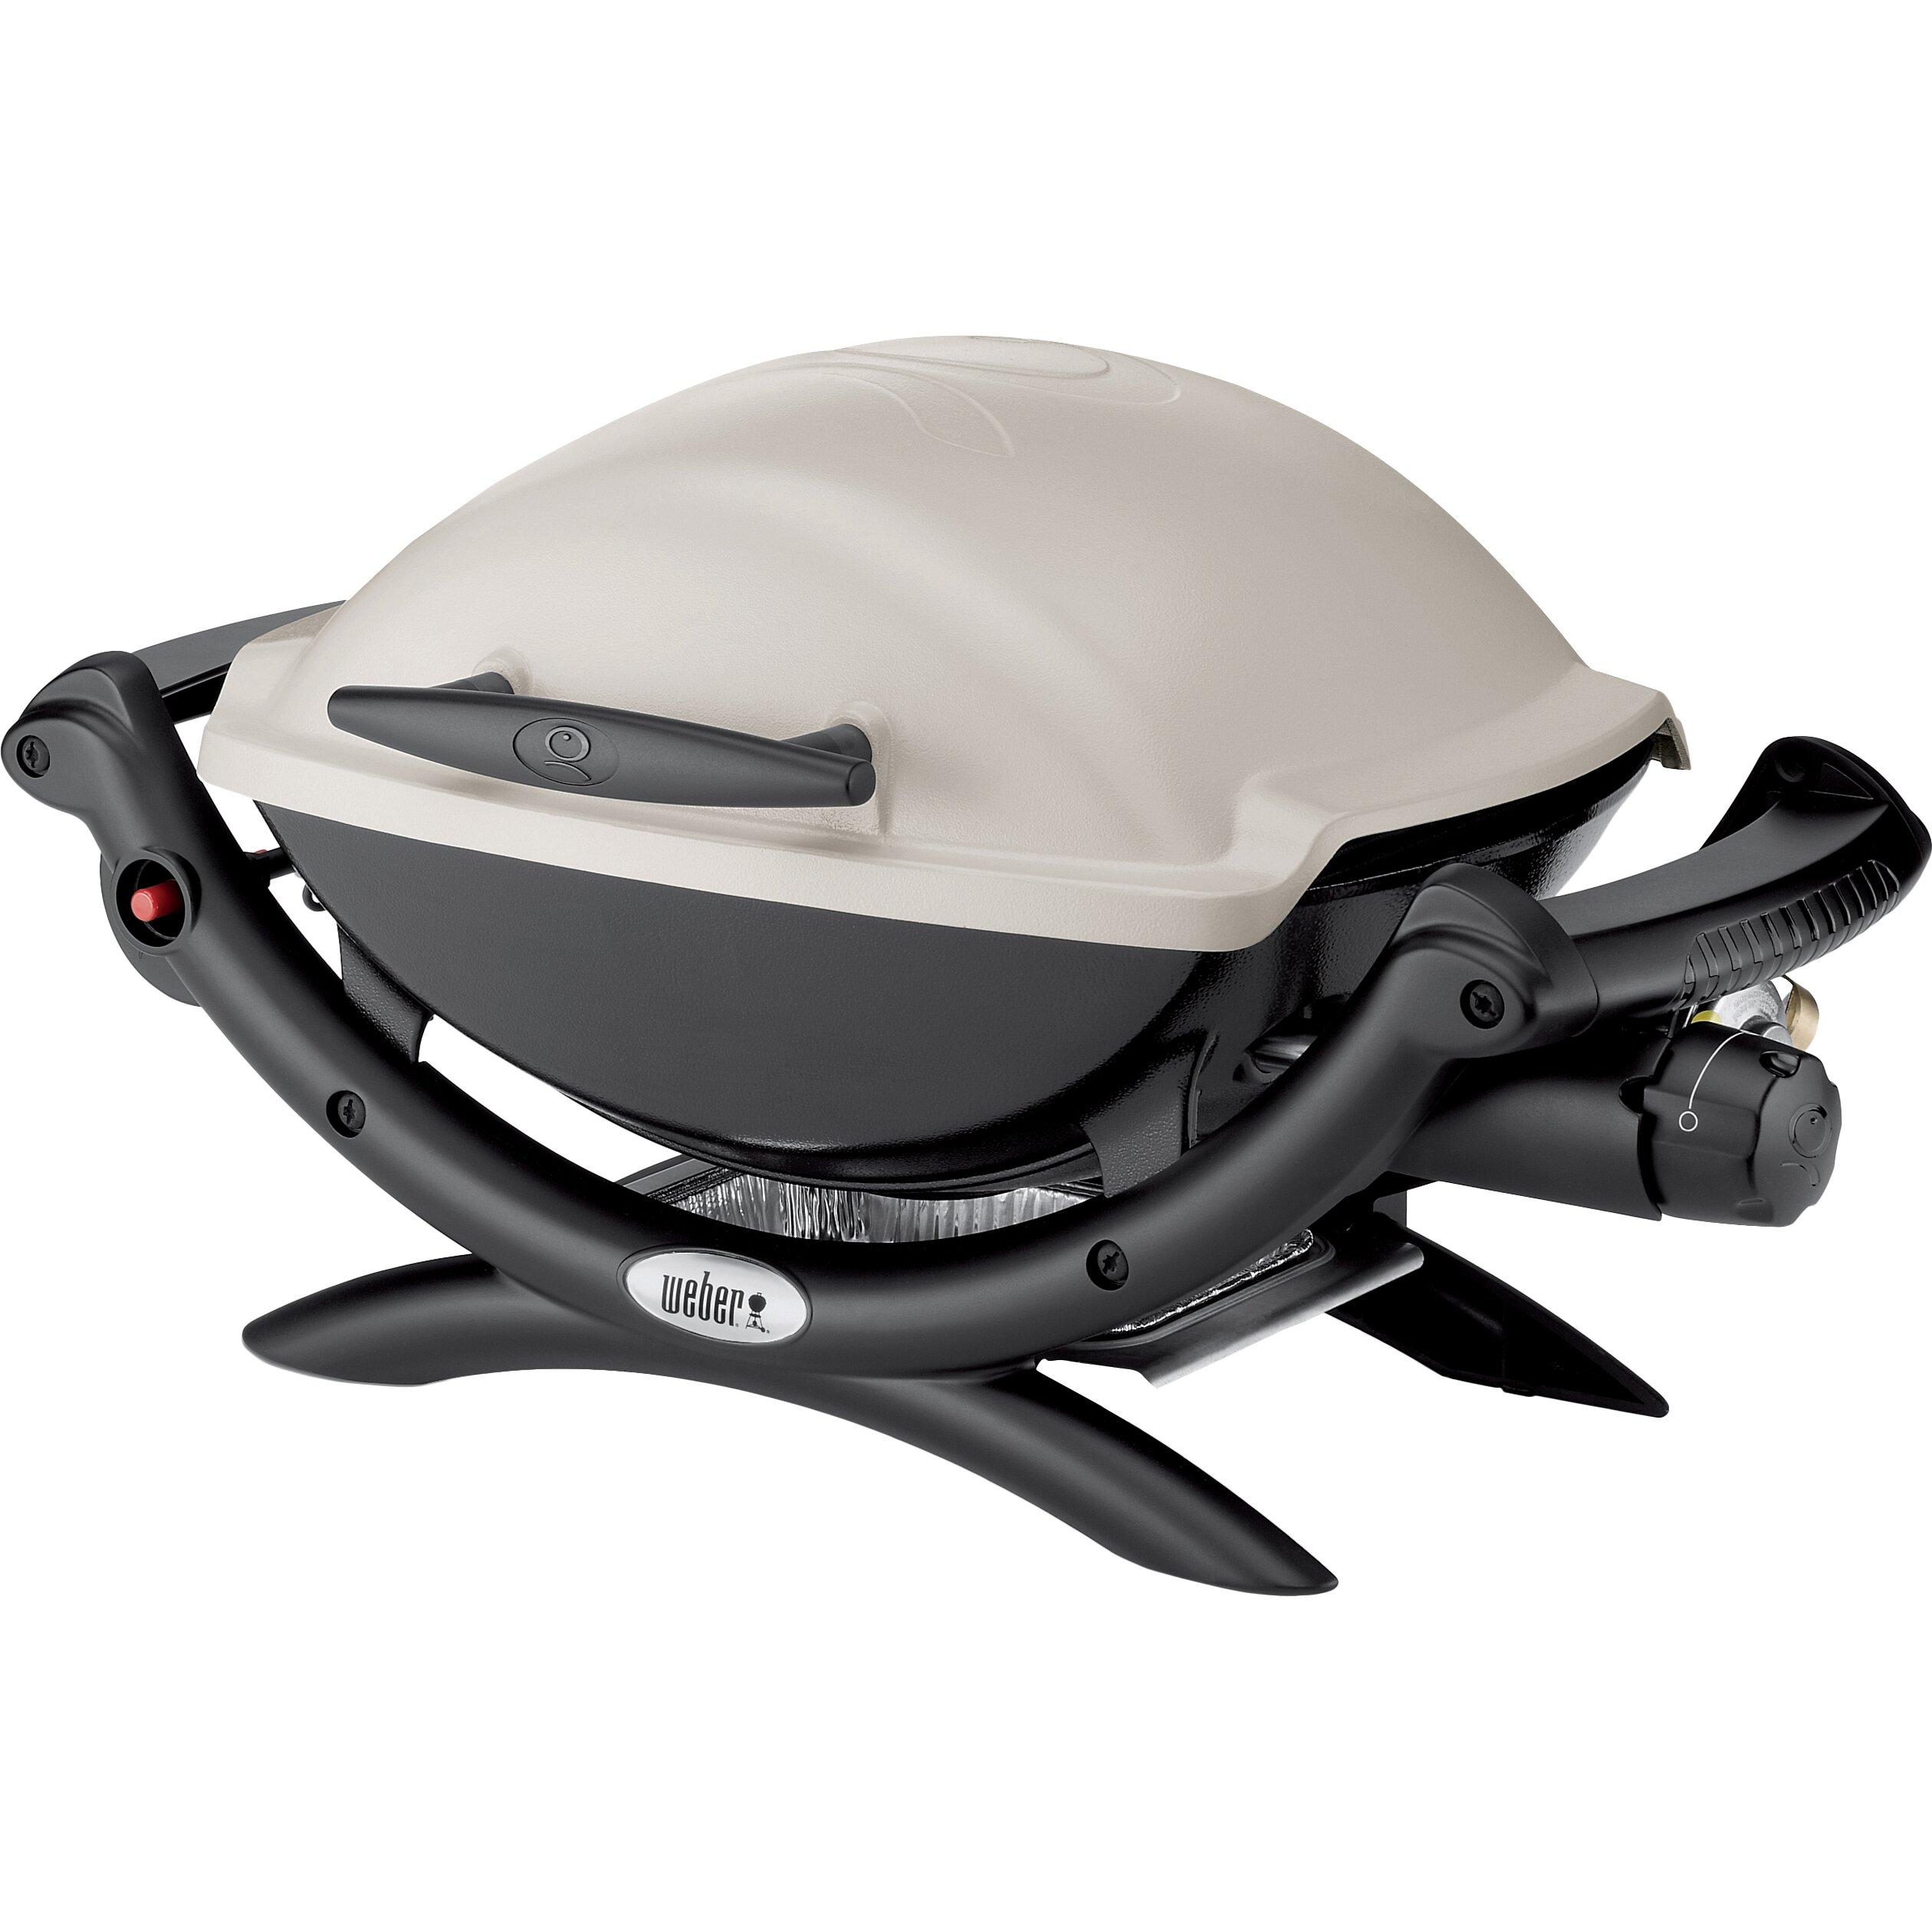 q series 1000 lp titanium portable gas grill wayfair. Black Bedroom Furniture Sets. Home Design Ideas